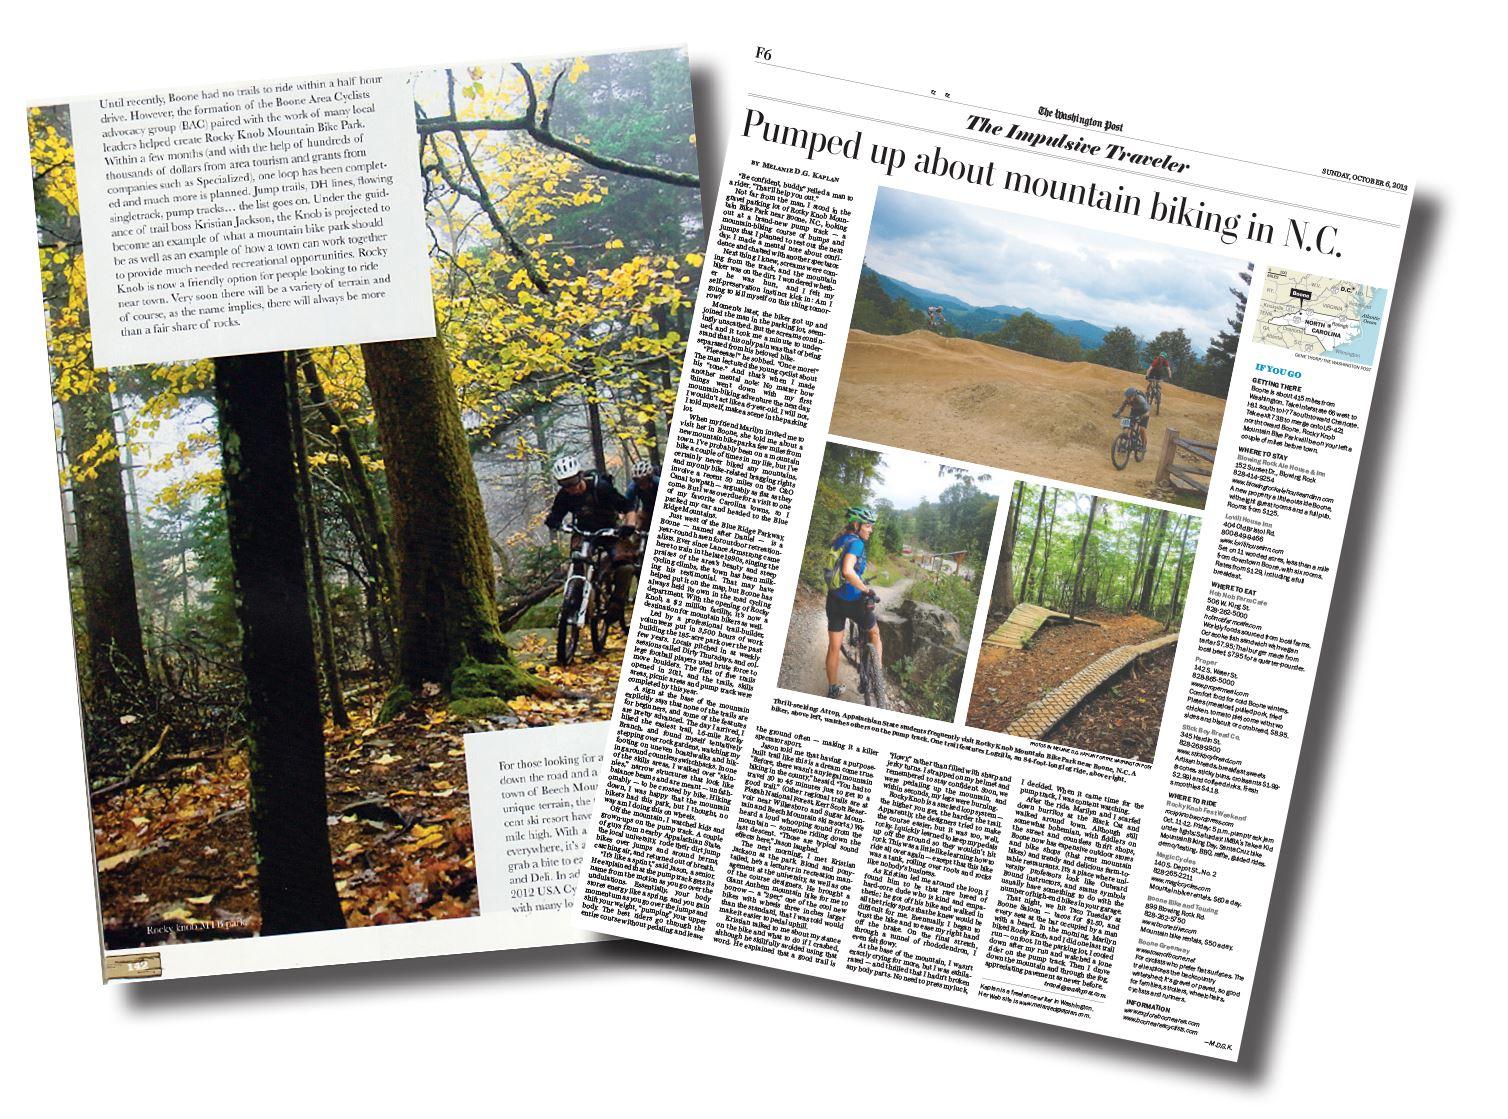 Rocky Knob Mountain Bike Park Destination By Design